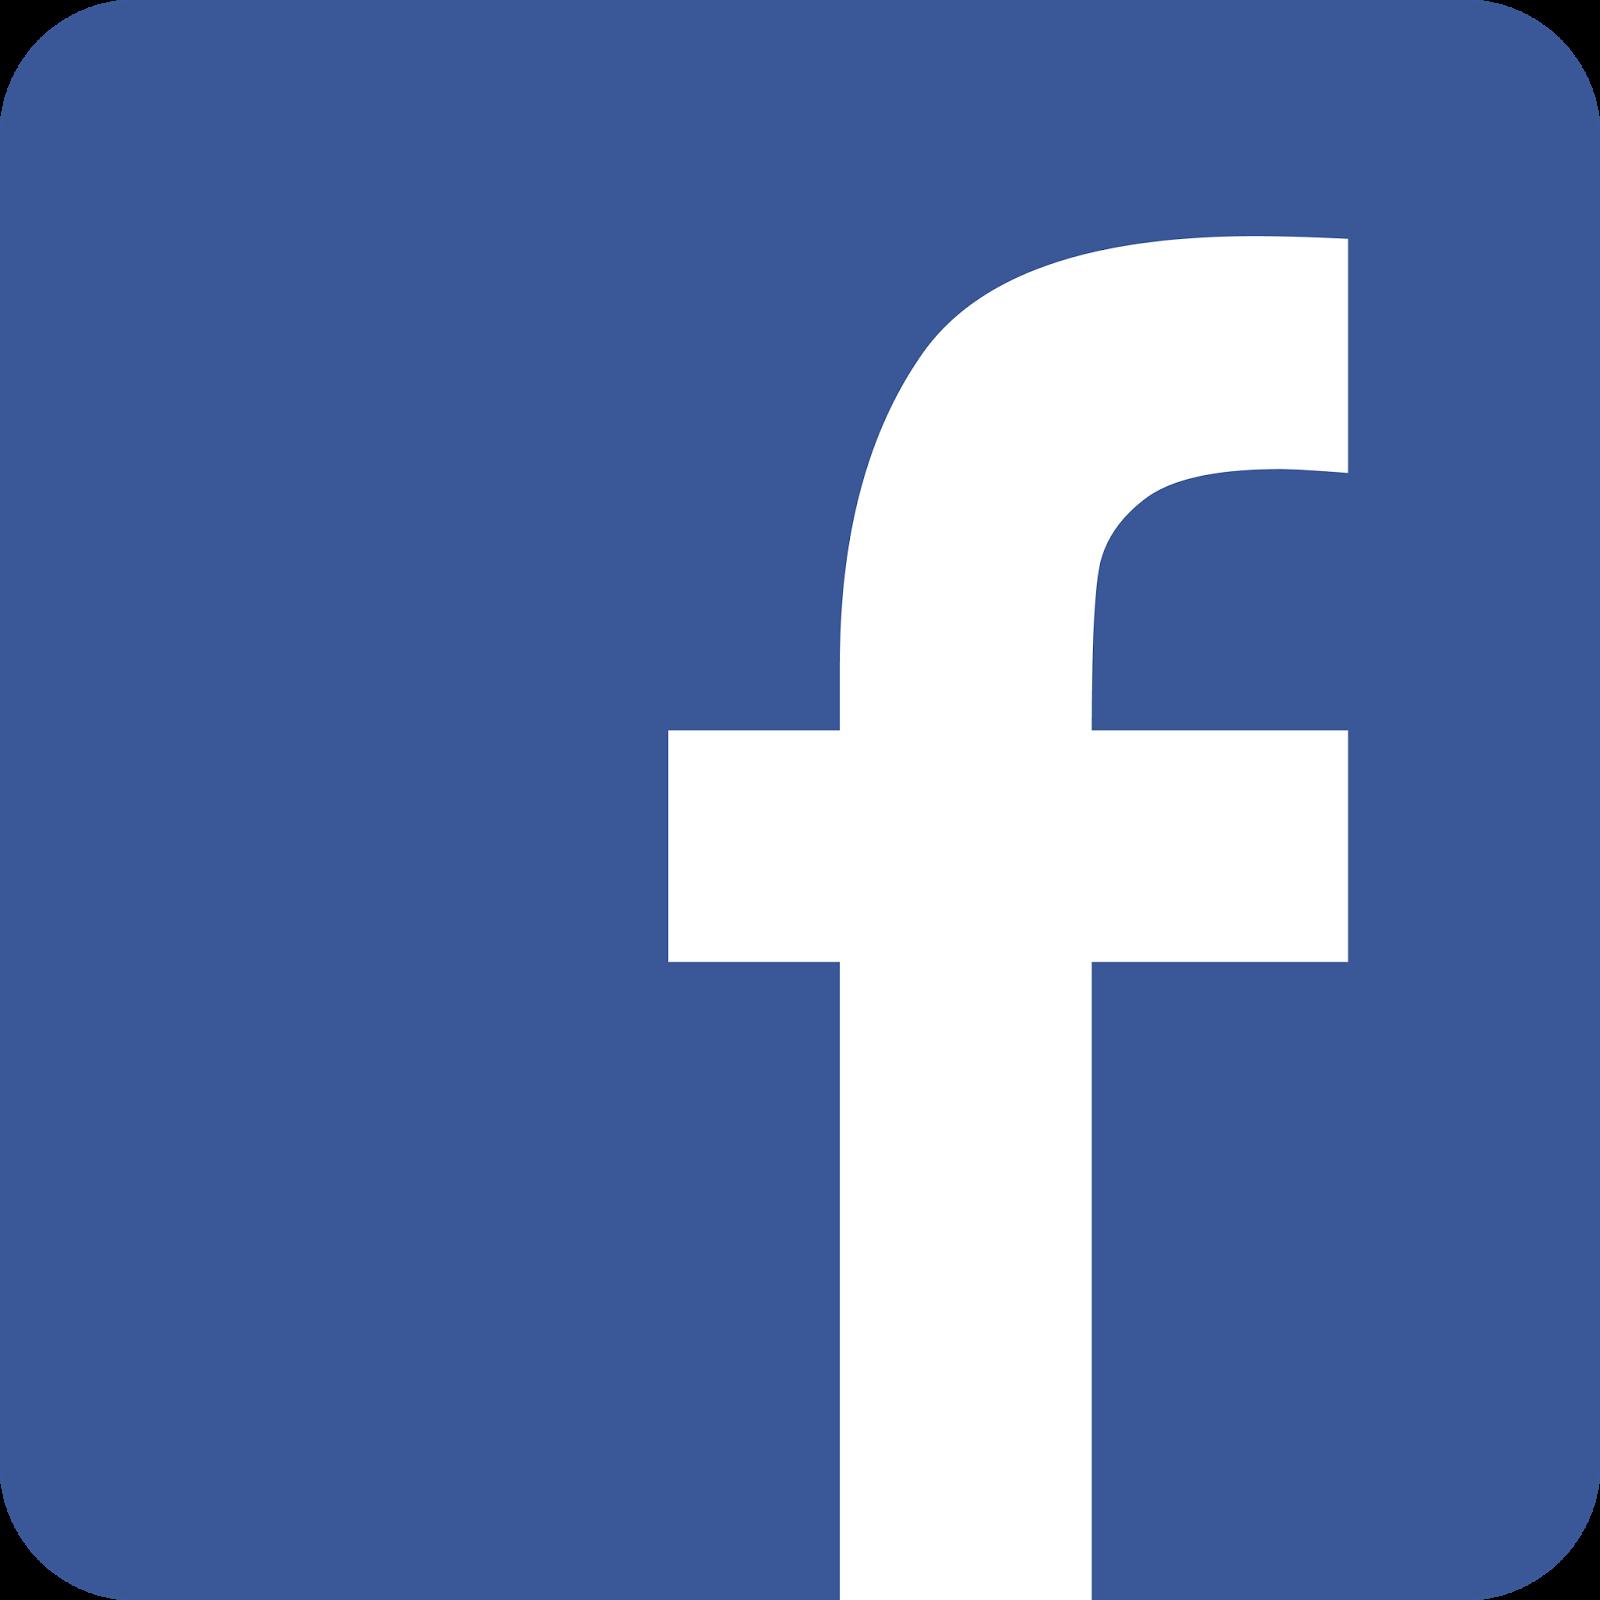 Facebook advertising consulting